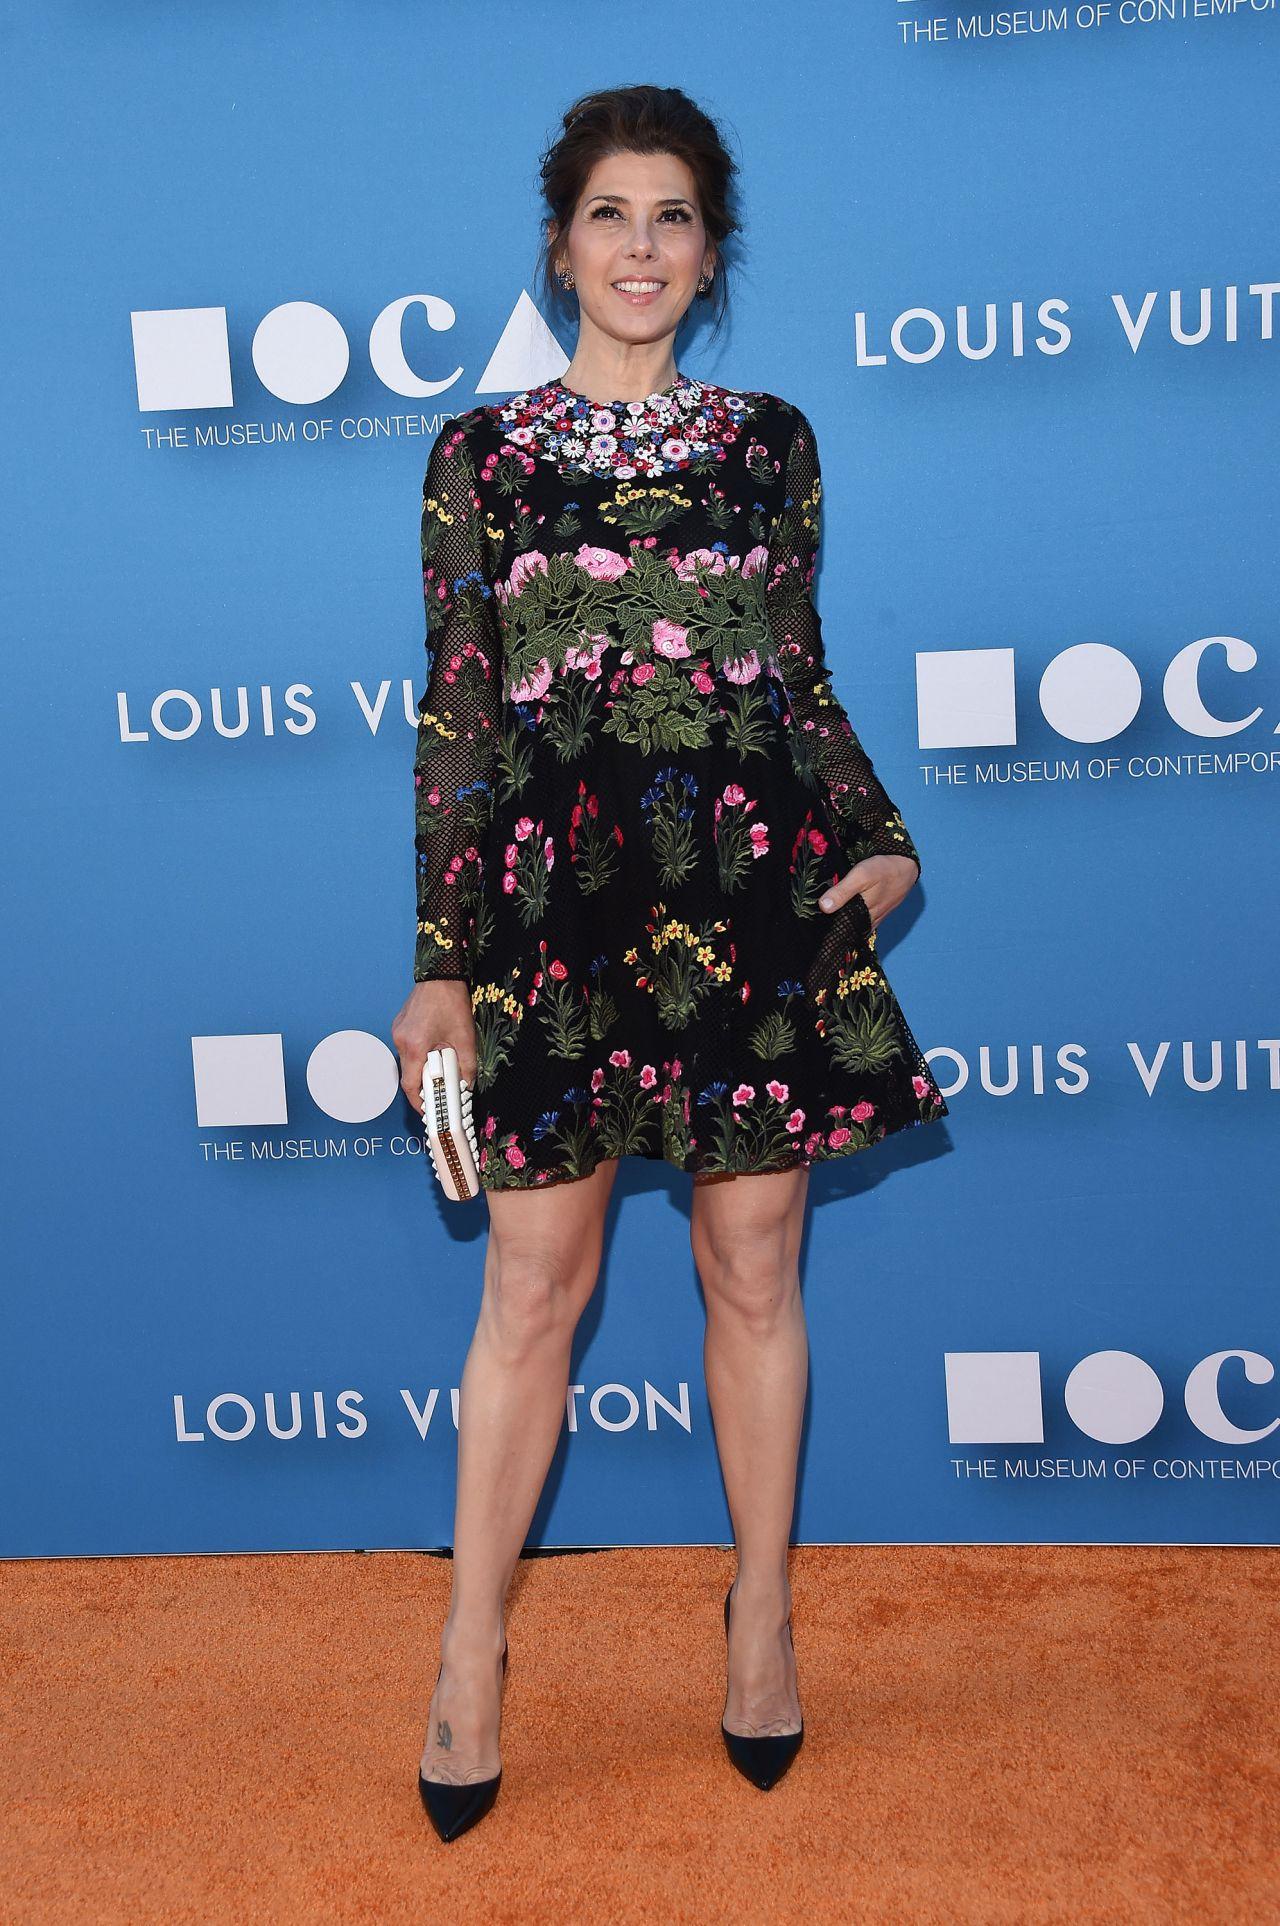 Oscars Fug Carpet: Marisa Tomei in Azzaro Couture - Go Fug Yourself